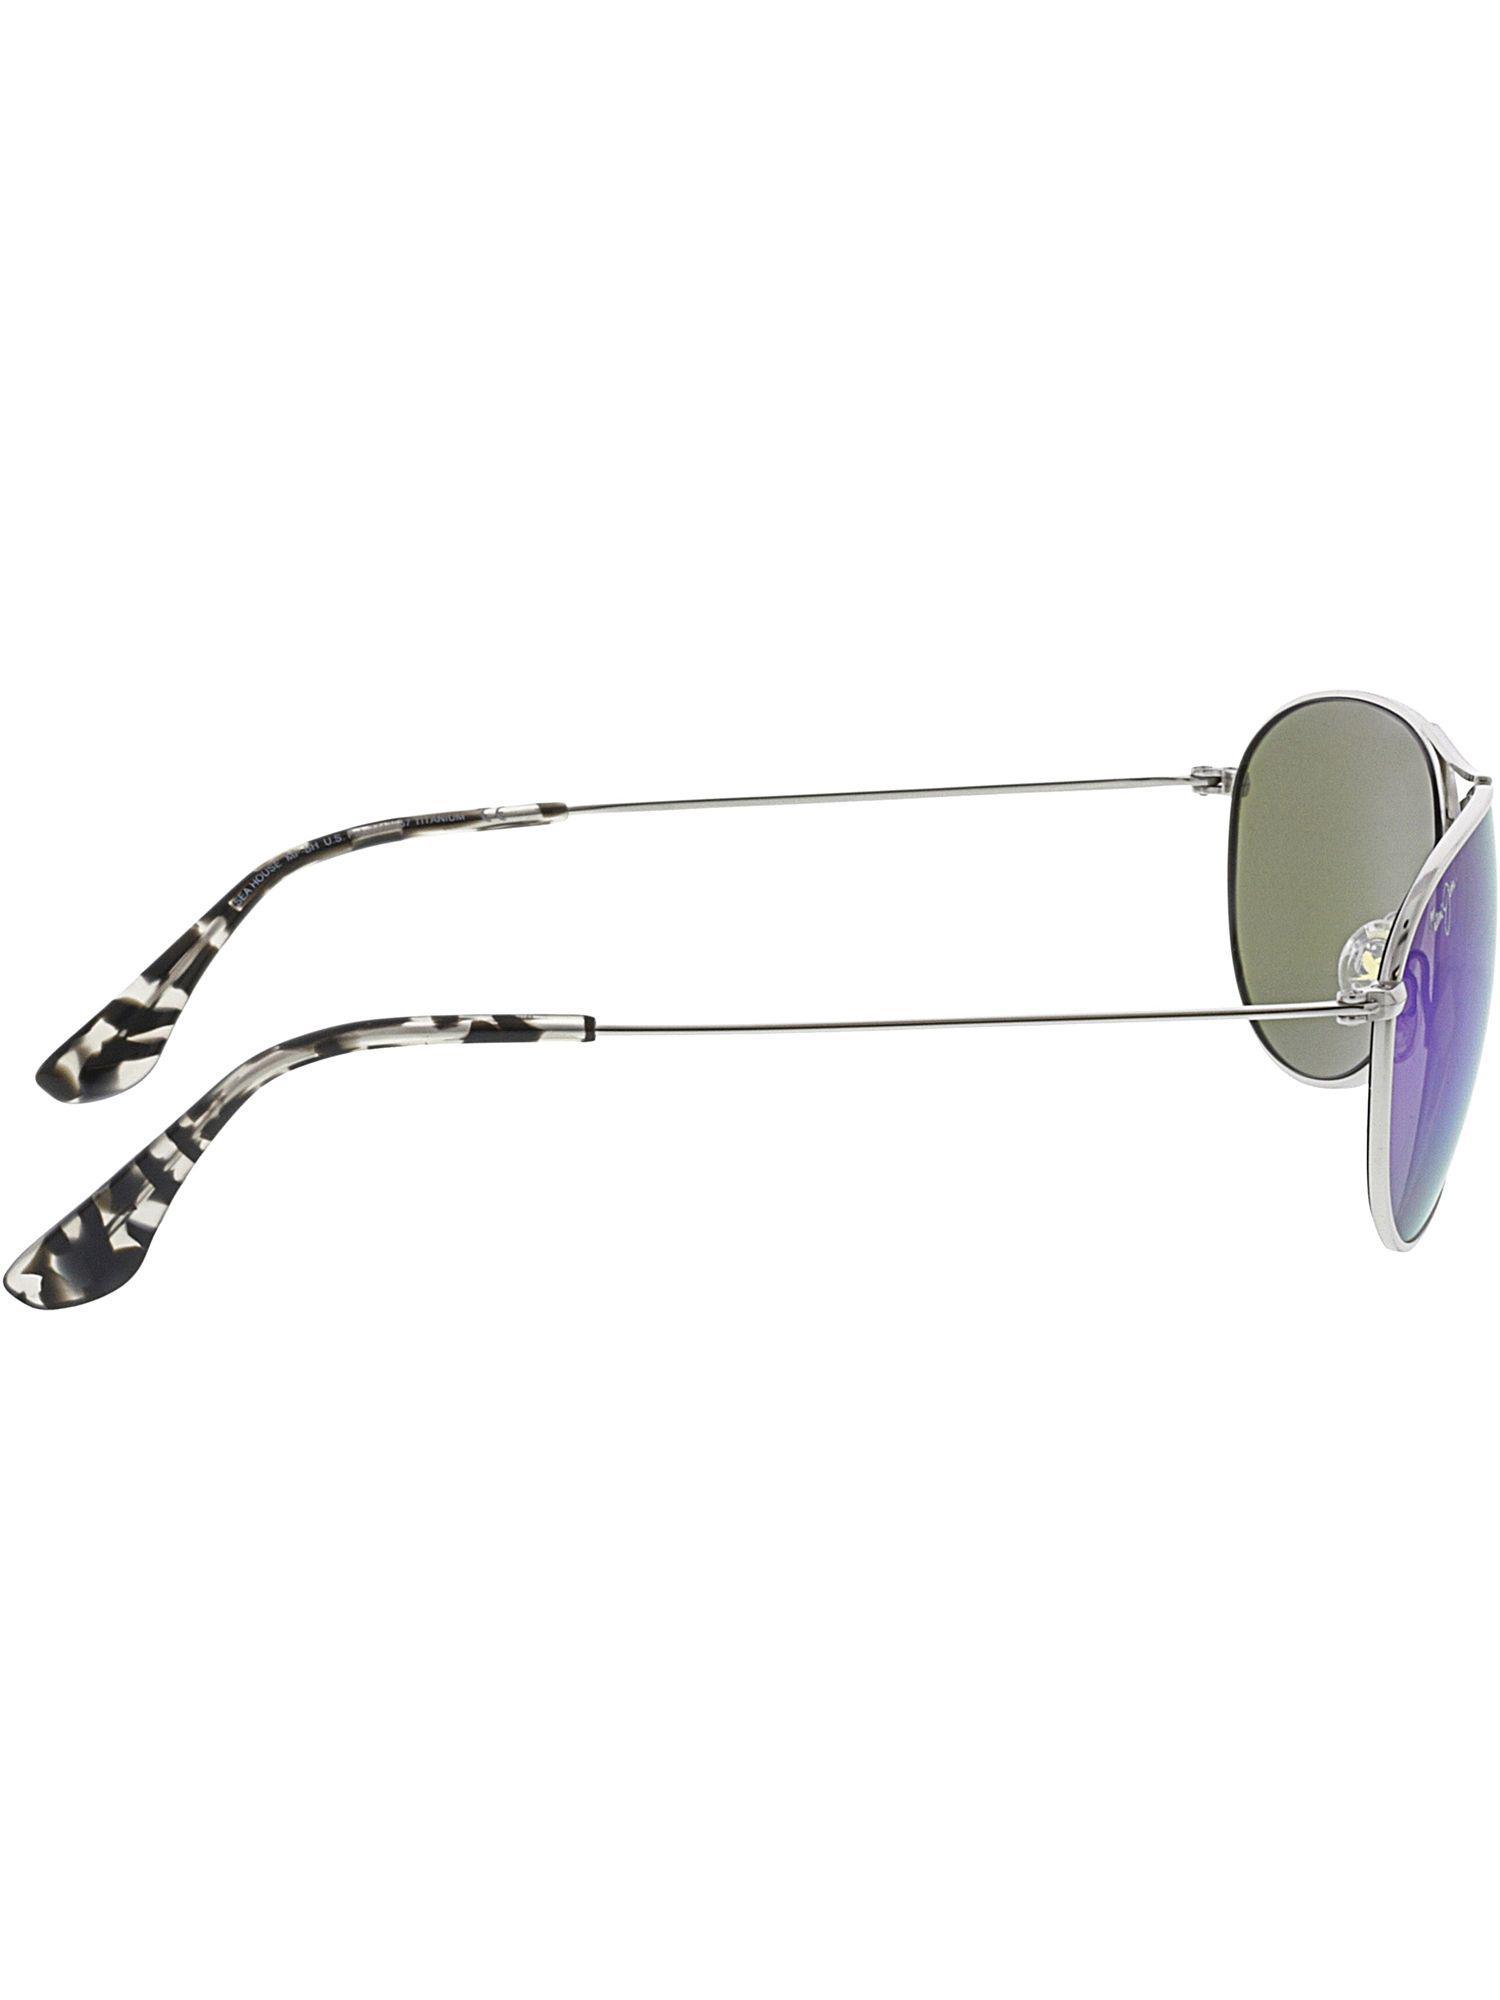 2c730d7882107 Lyst - Maui Jim Women s Polarized Sea House B772-17 Silver Aviator  Sunglasses in Metallic